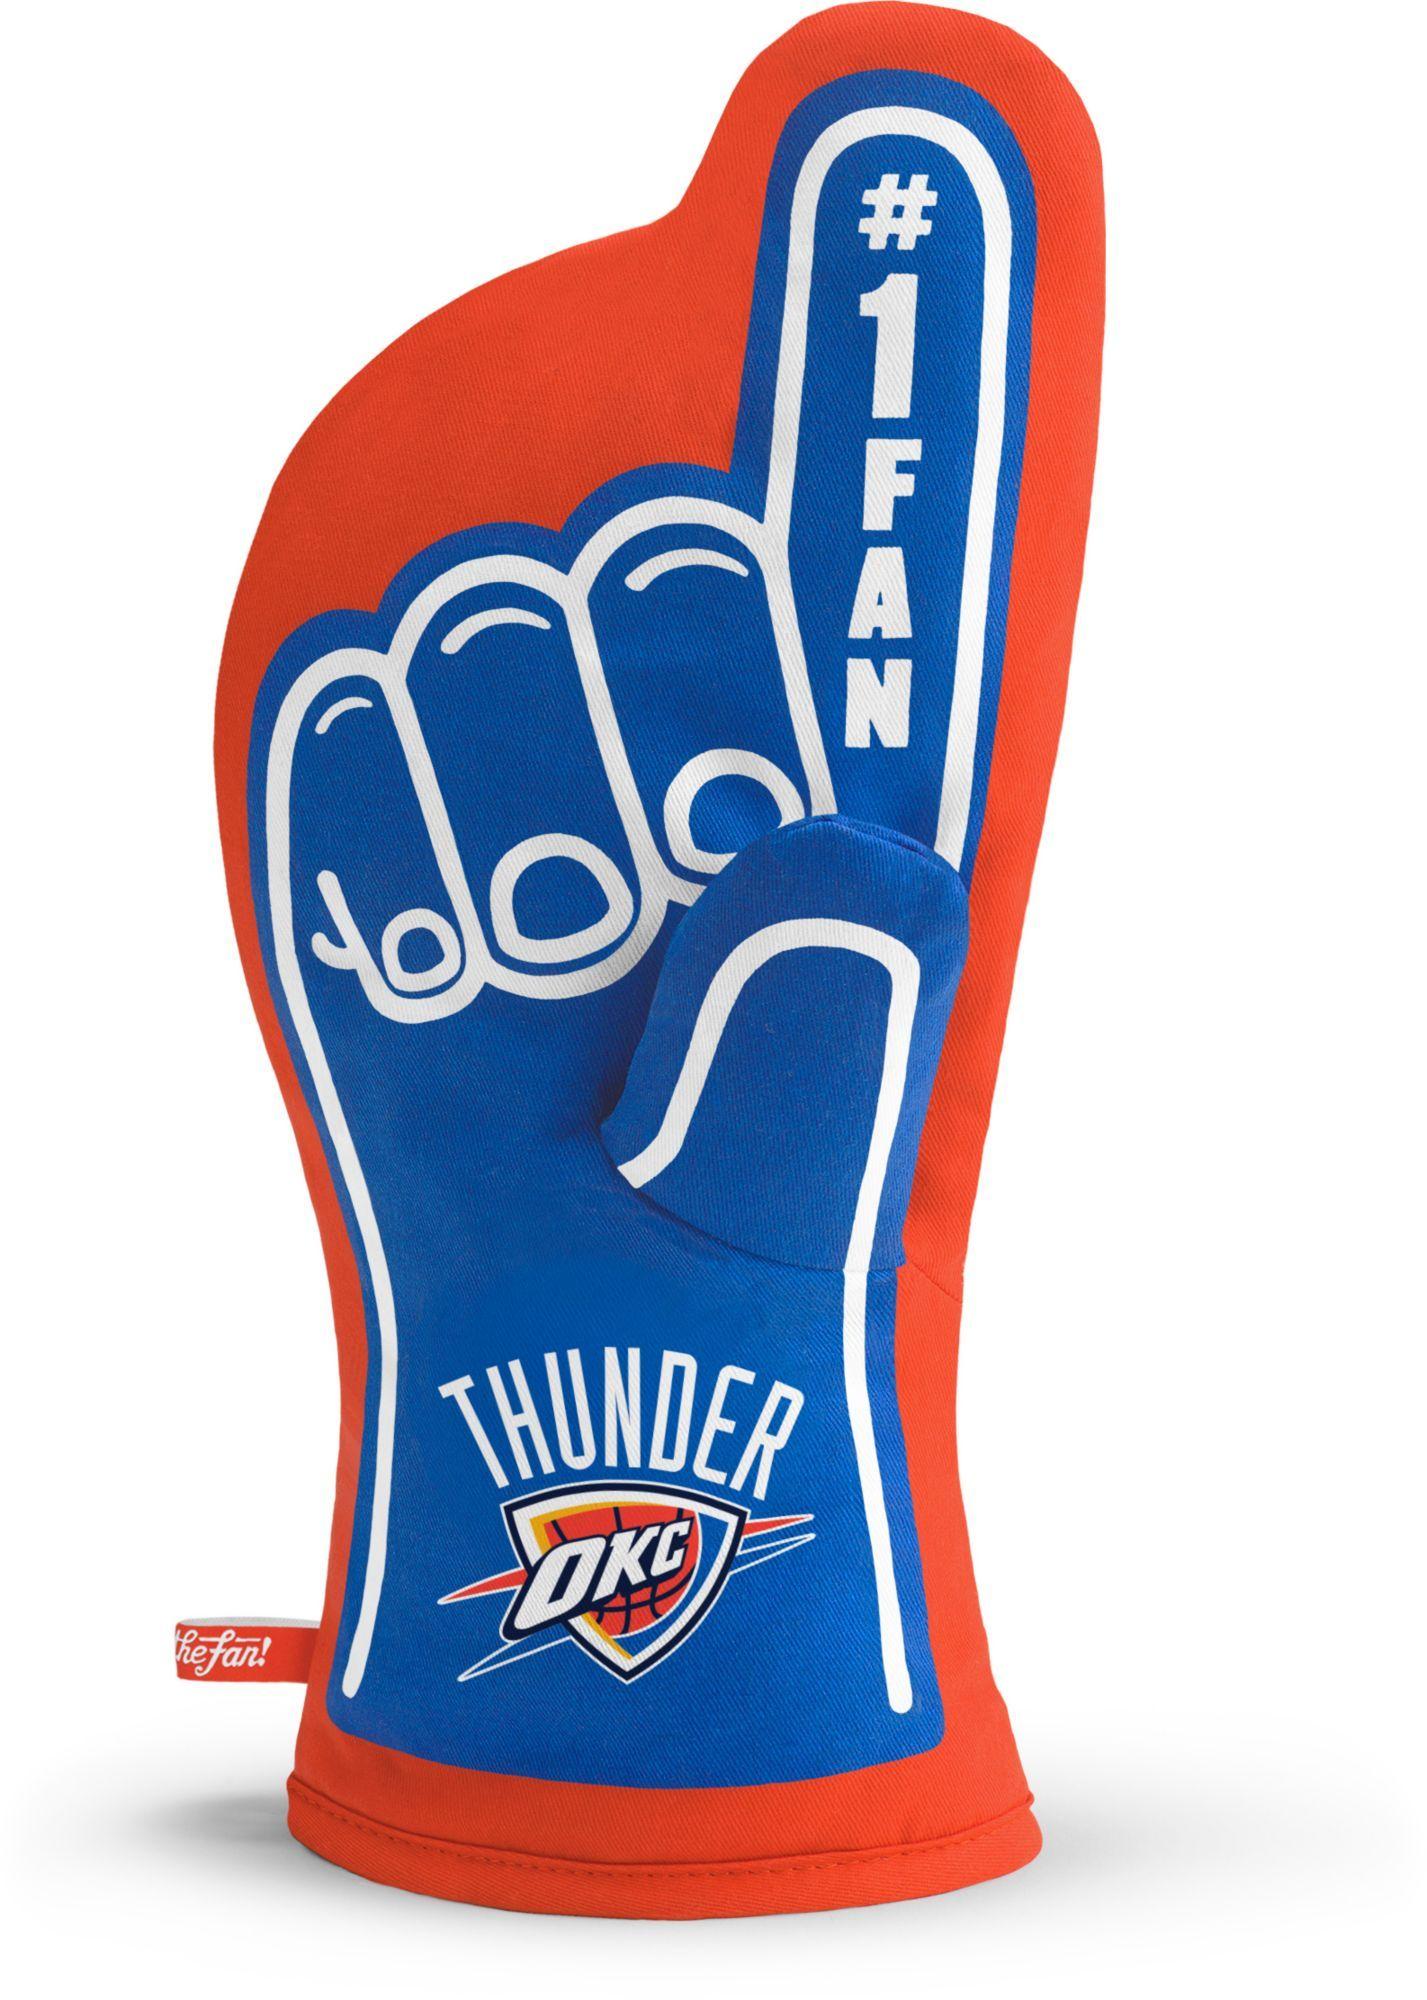 huge discount ea83a bfac3 NEW ERA NEW ERA OKLAHOMA CITY THUNDER NBA ON COURT COLLECTION POM KNIT HAT.   newera     New Era   Knitted hats, Thunder nba, Oklahoma city thunder